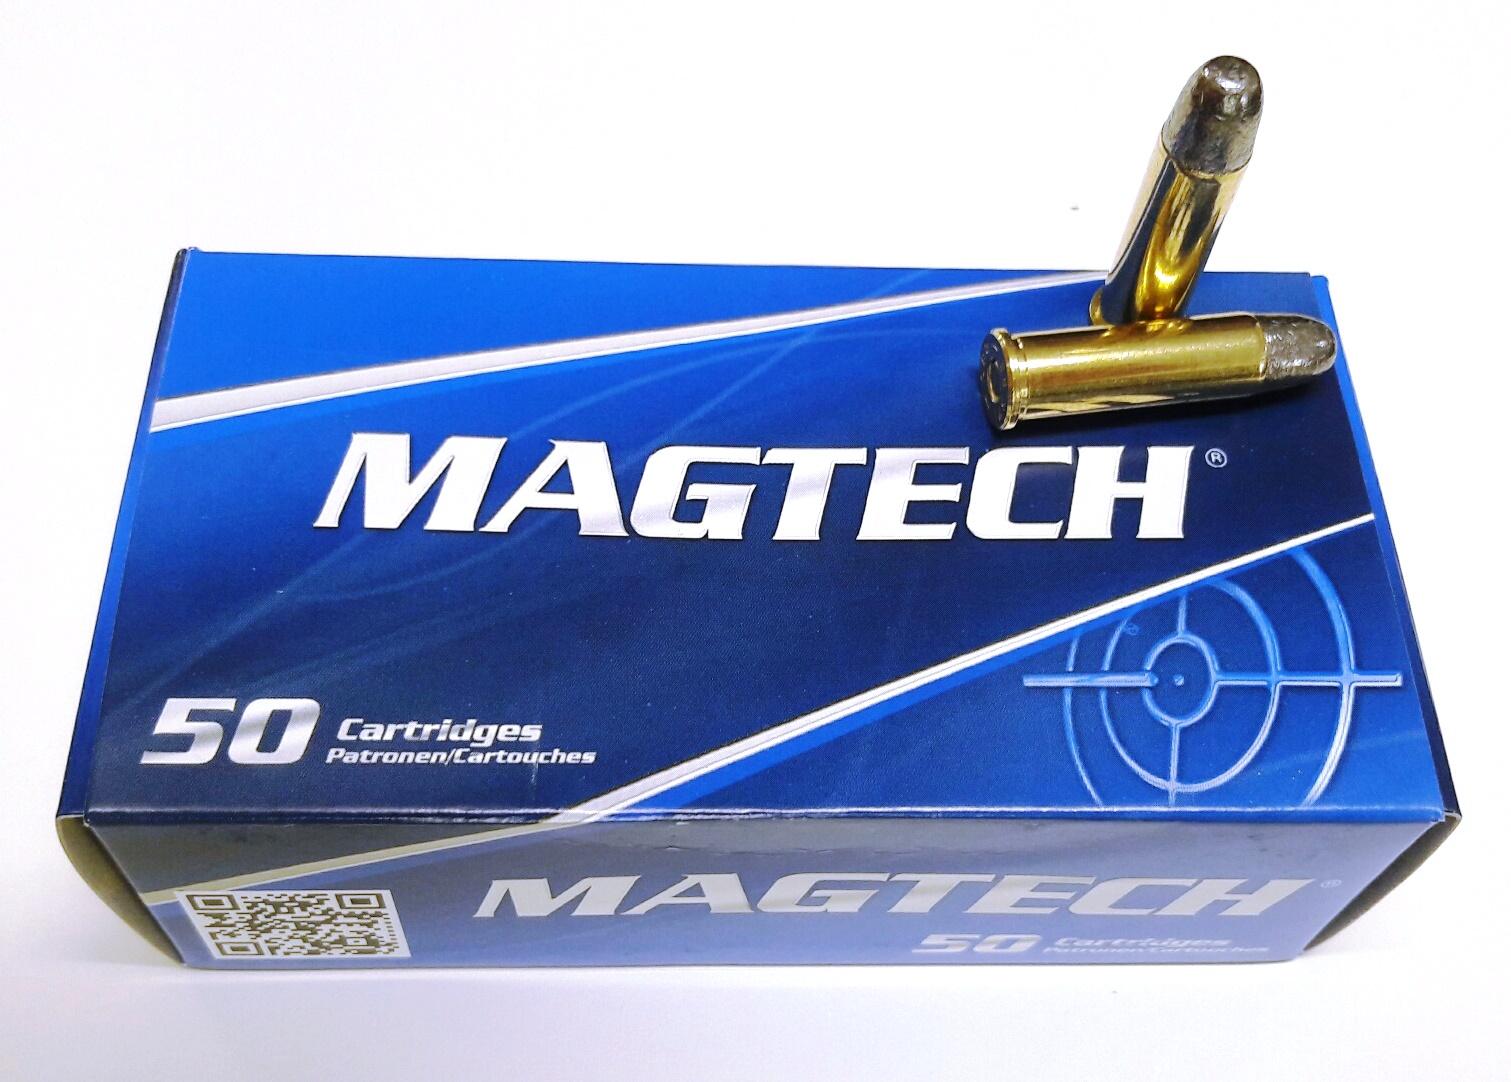 Magtech Revolverpatrone .38Spec, LRN, 158grs